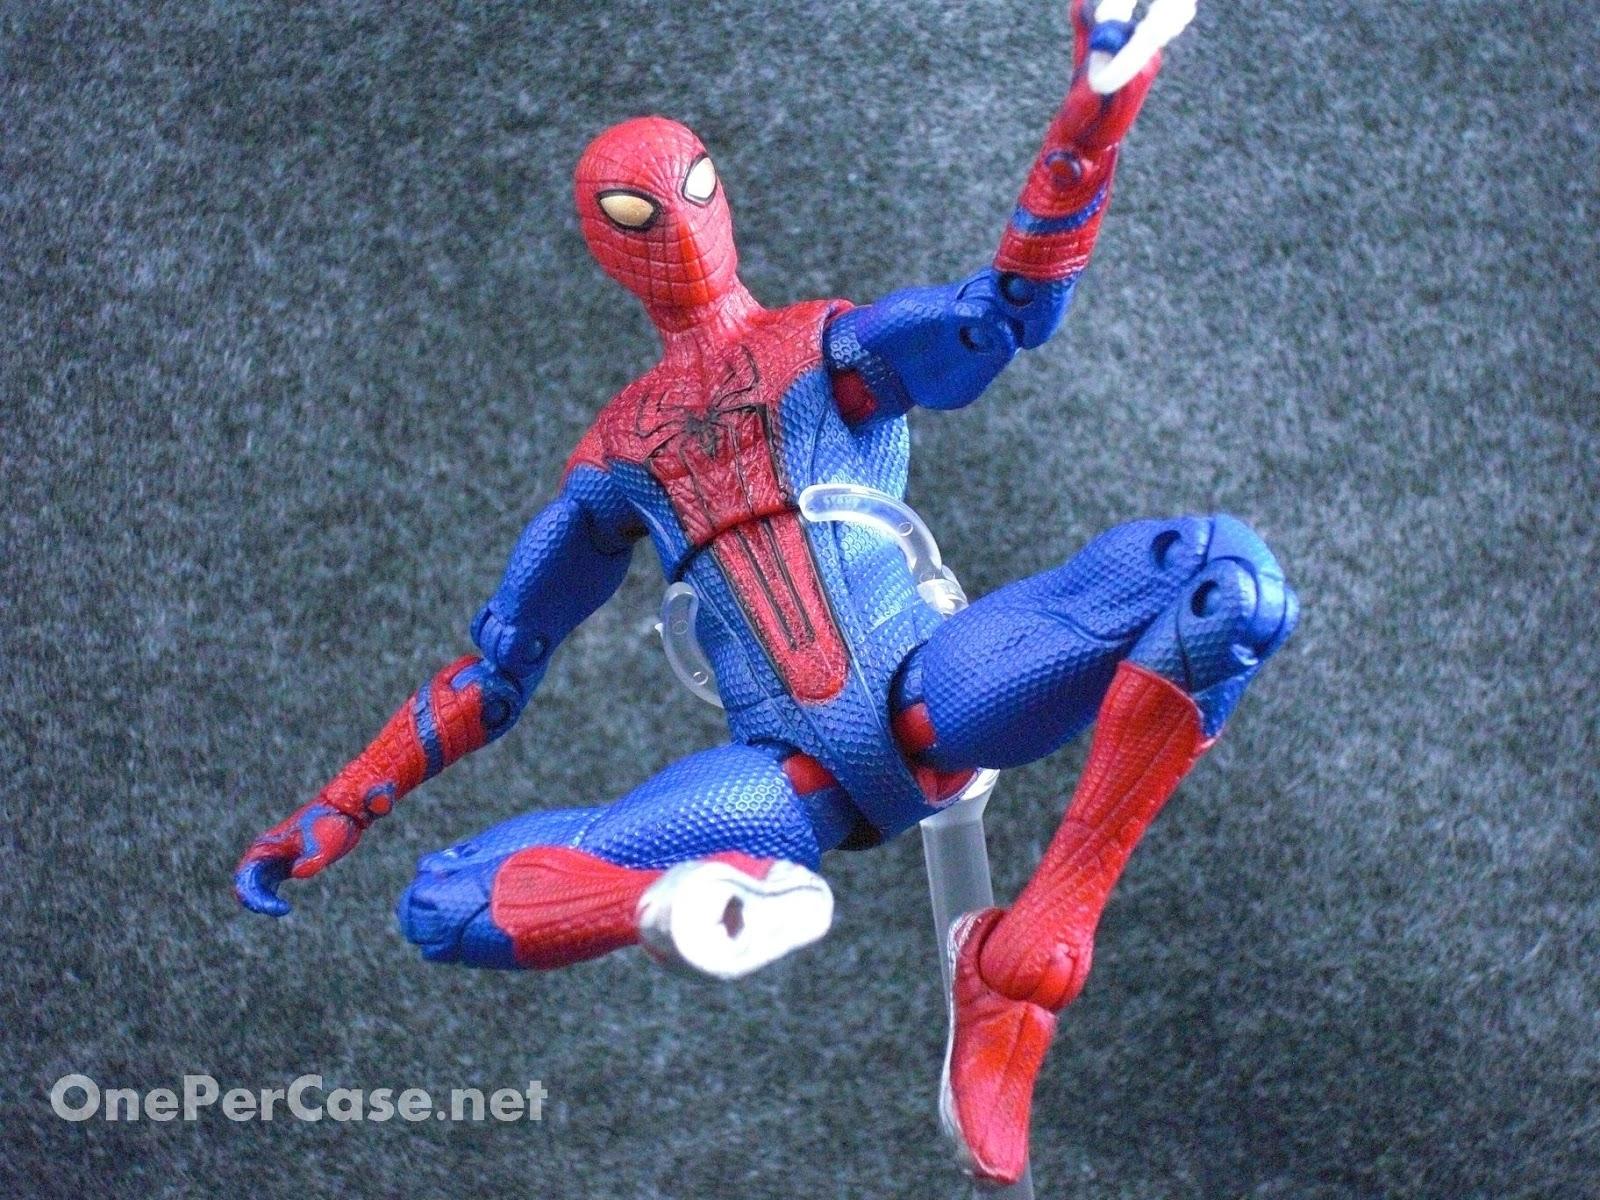 One Per Case: The Amazing Spider-Man Walmart Exclusive 6 ...